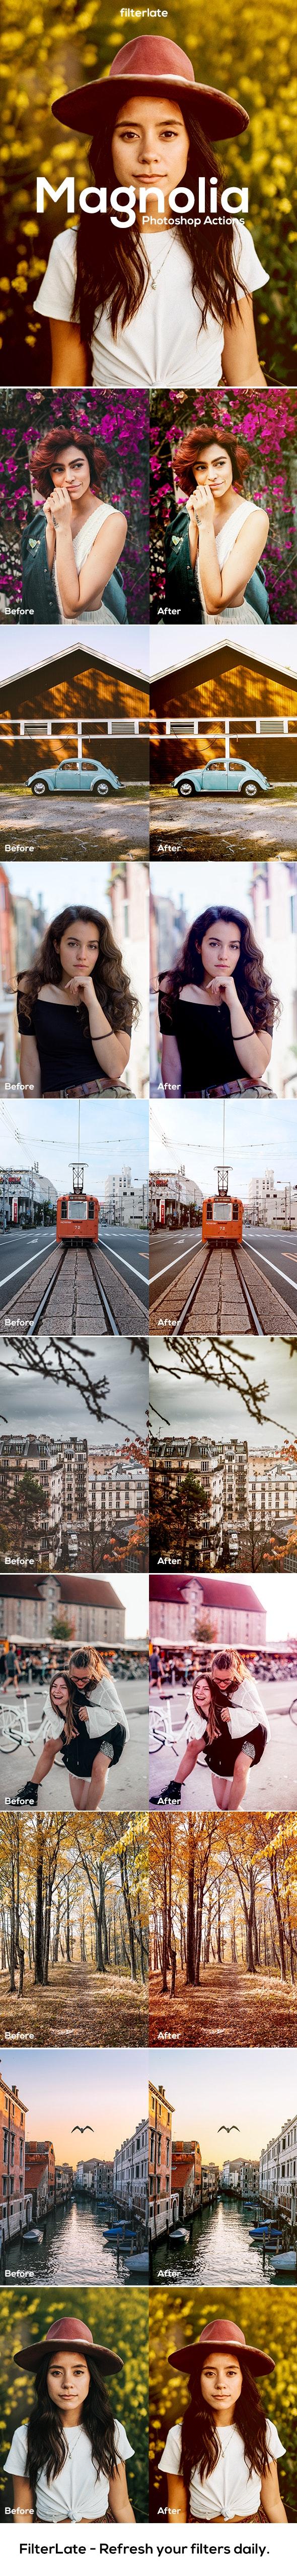 Magnolia Tones - Actions Photoshop